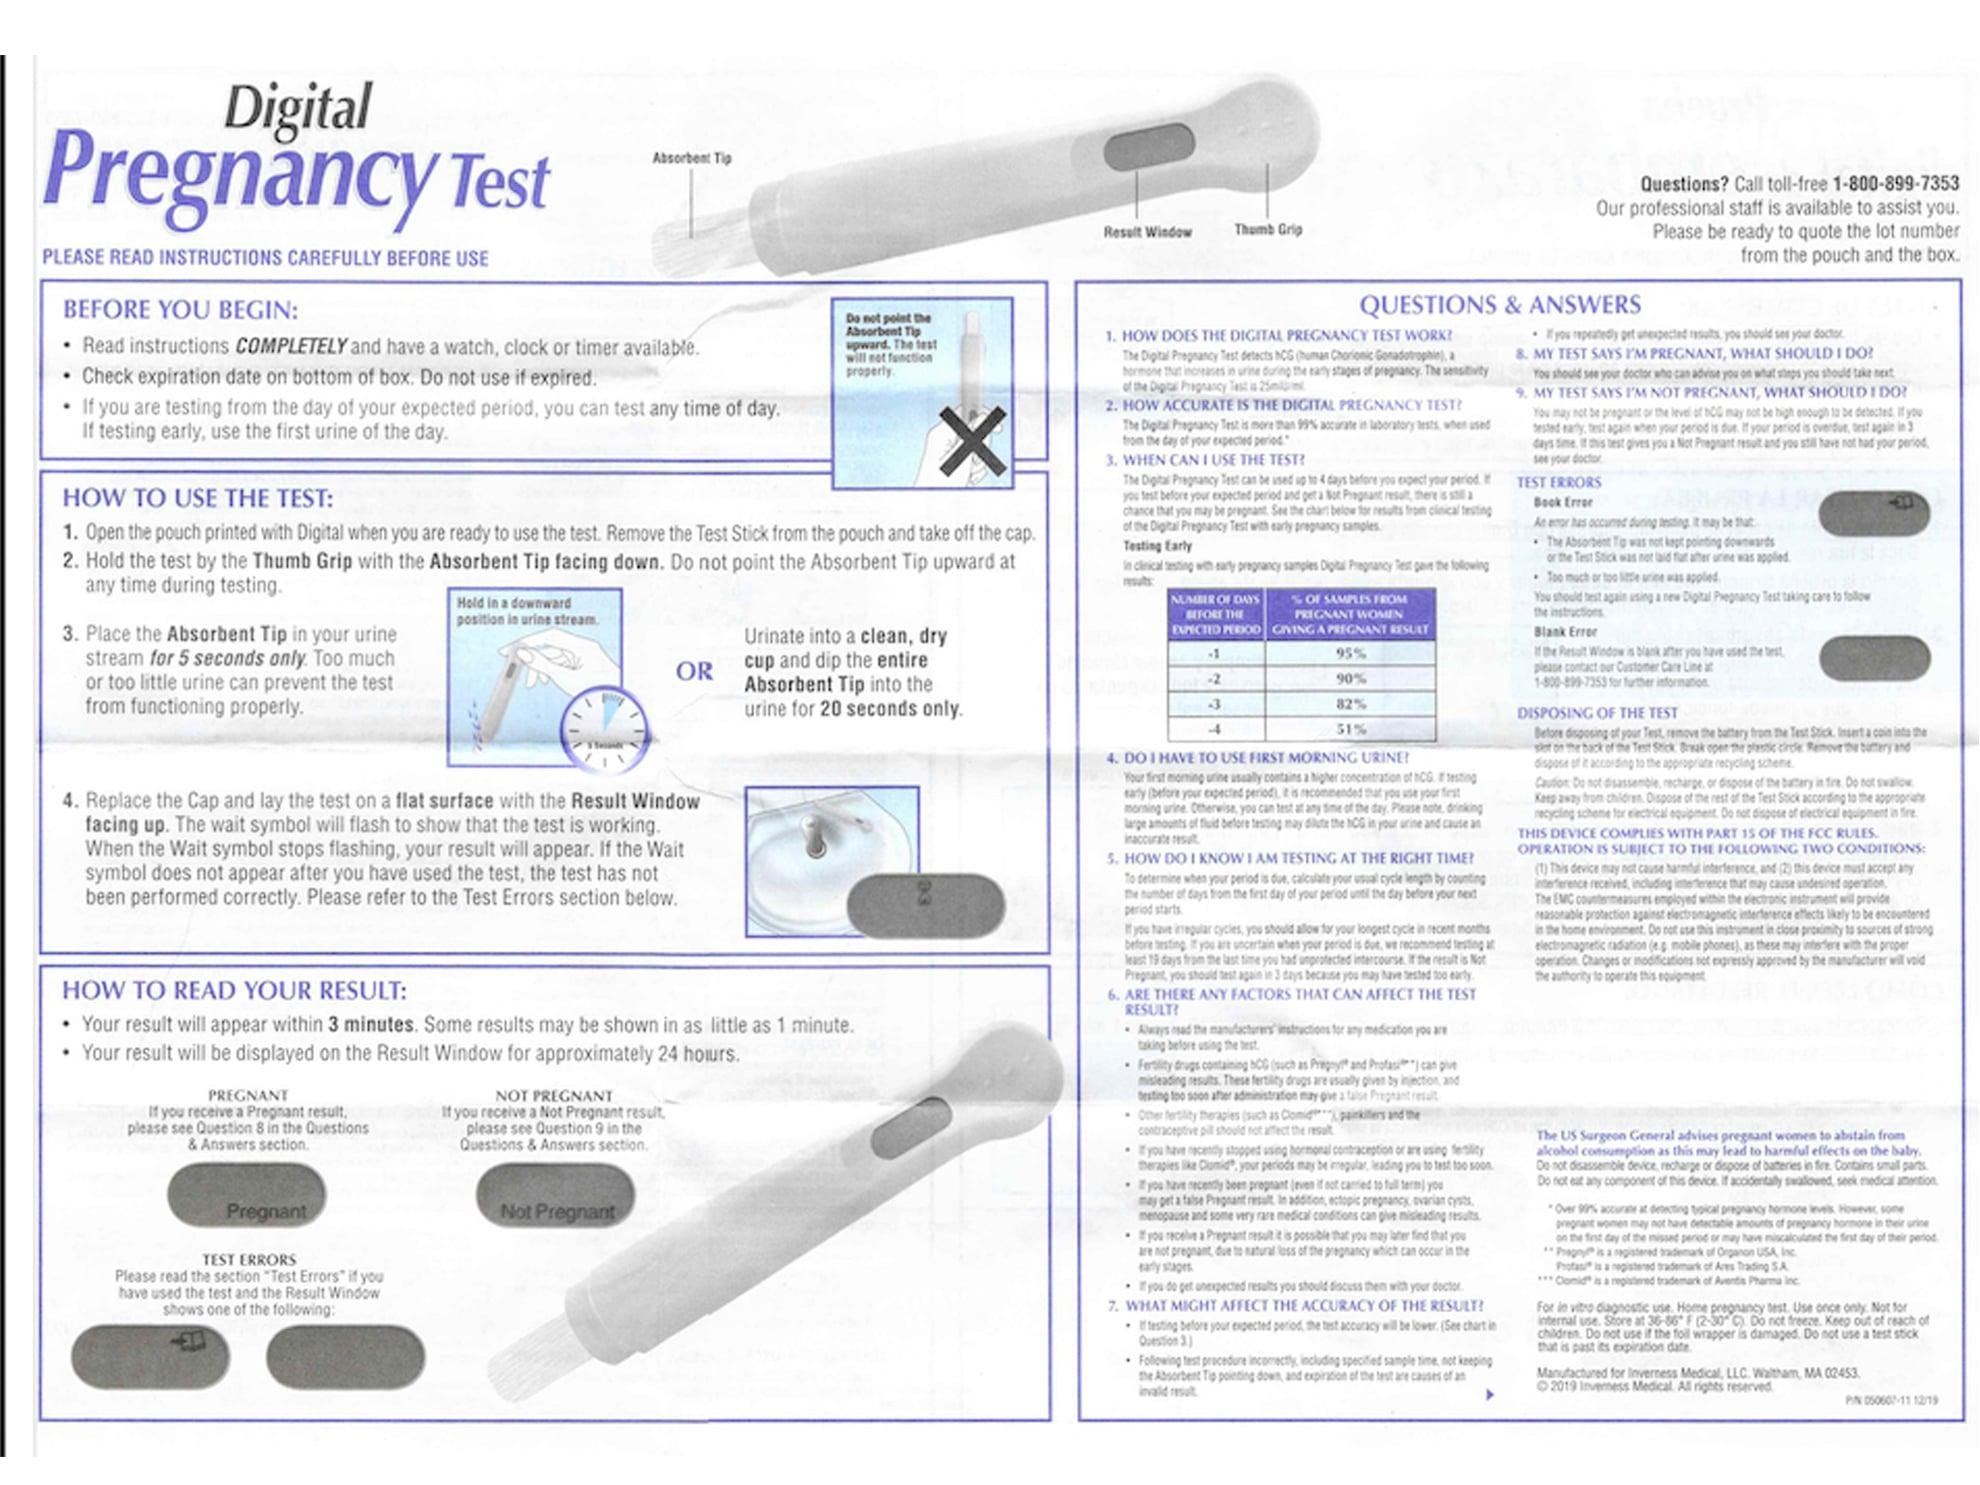 Walgreens Digital Pregnancy Test instructions